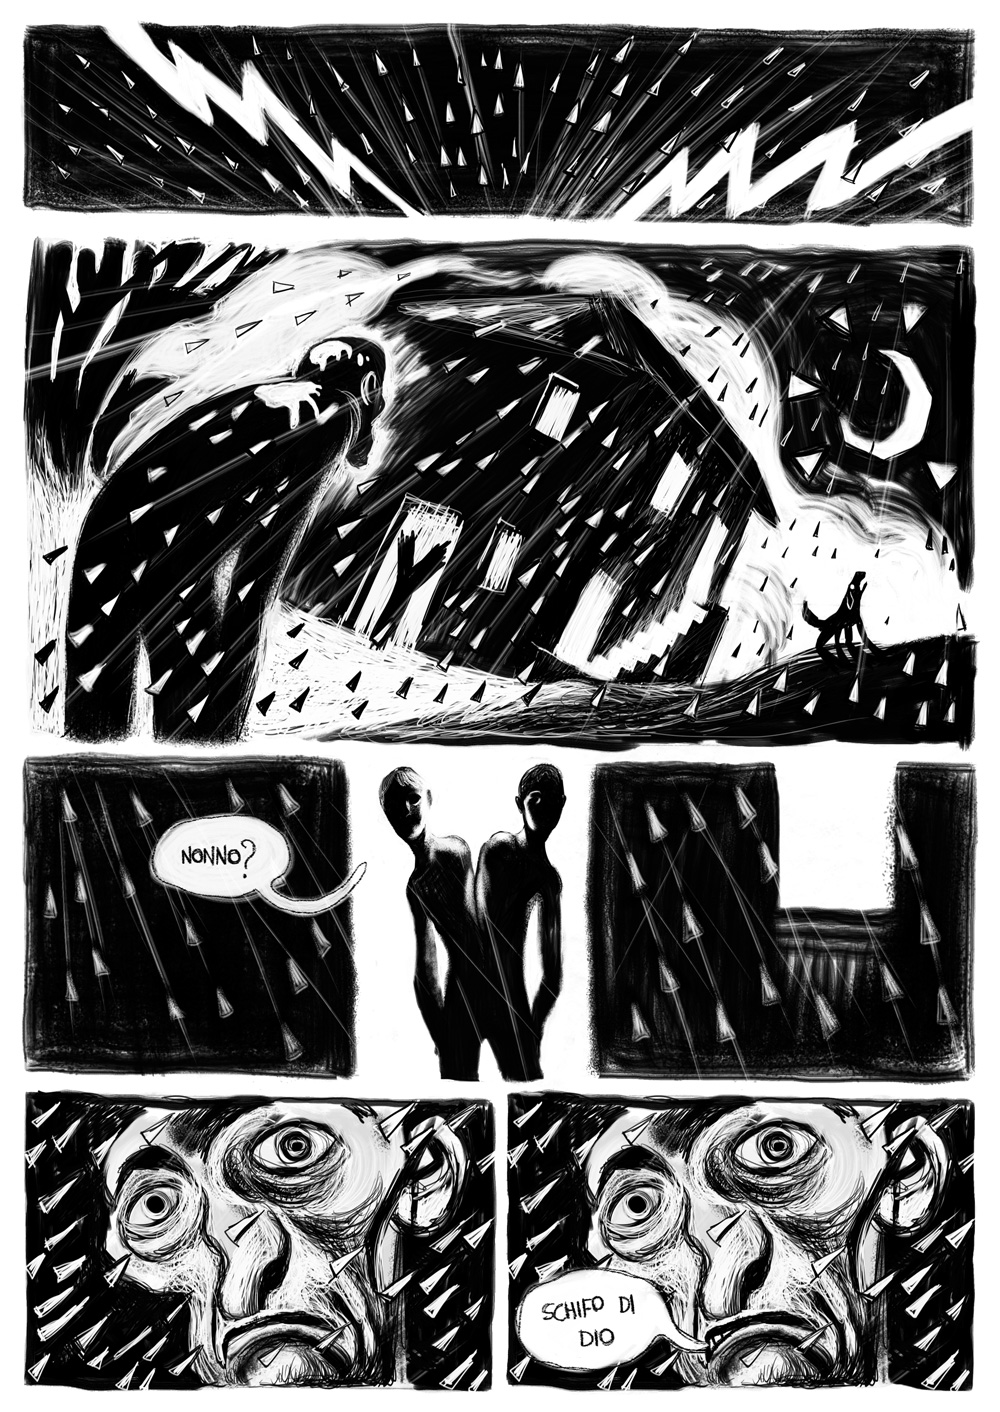 Uno In Diviso - Pagina 05